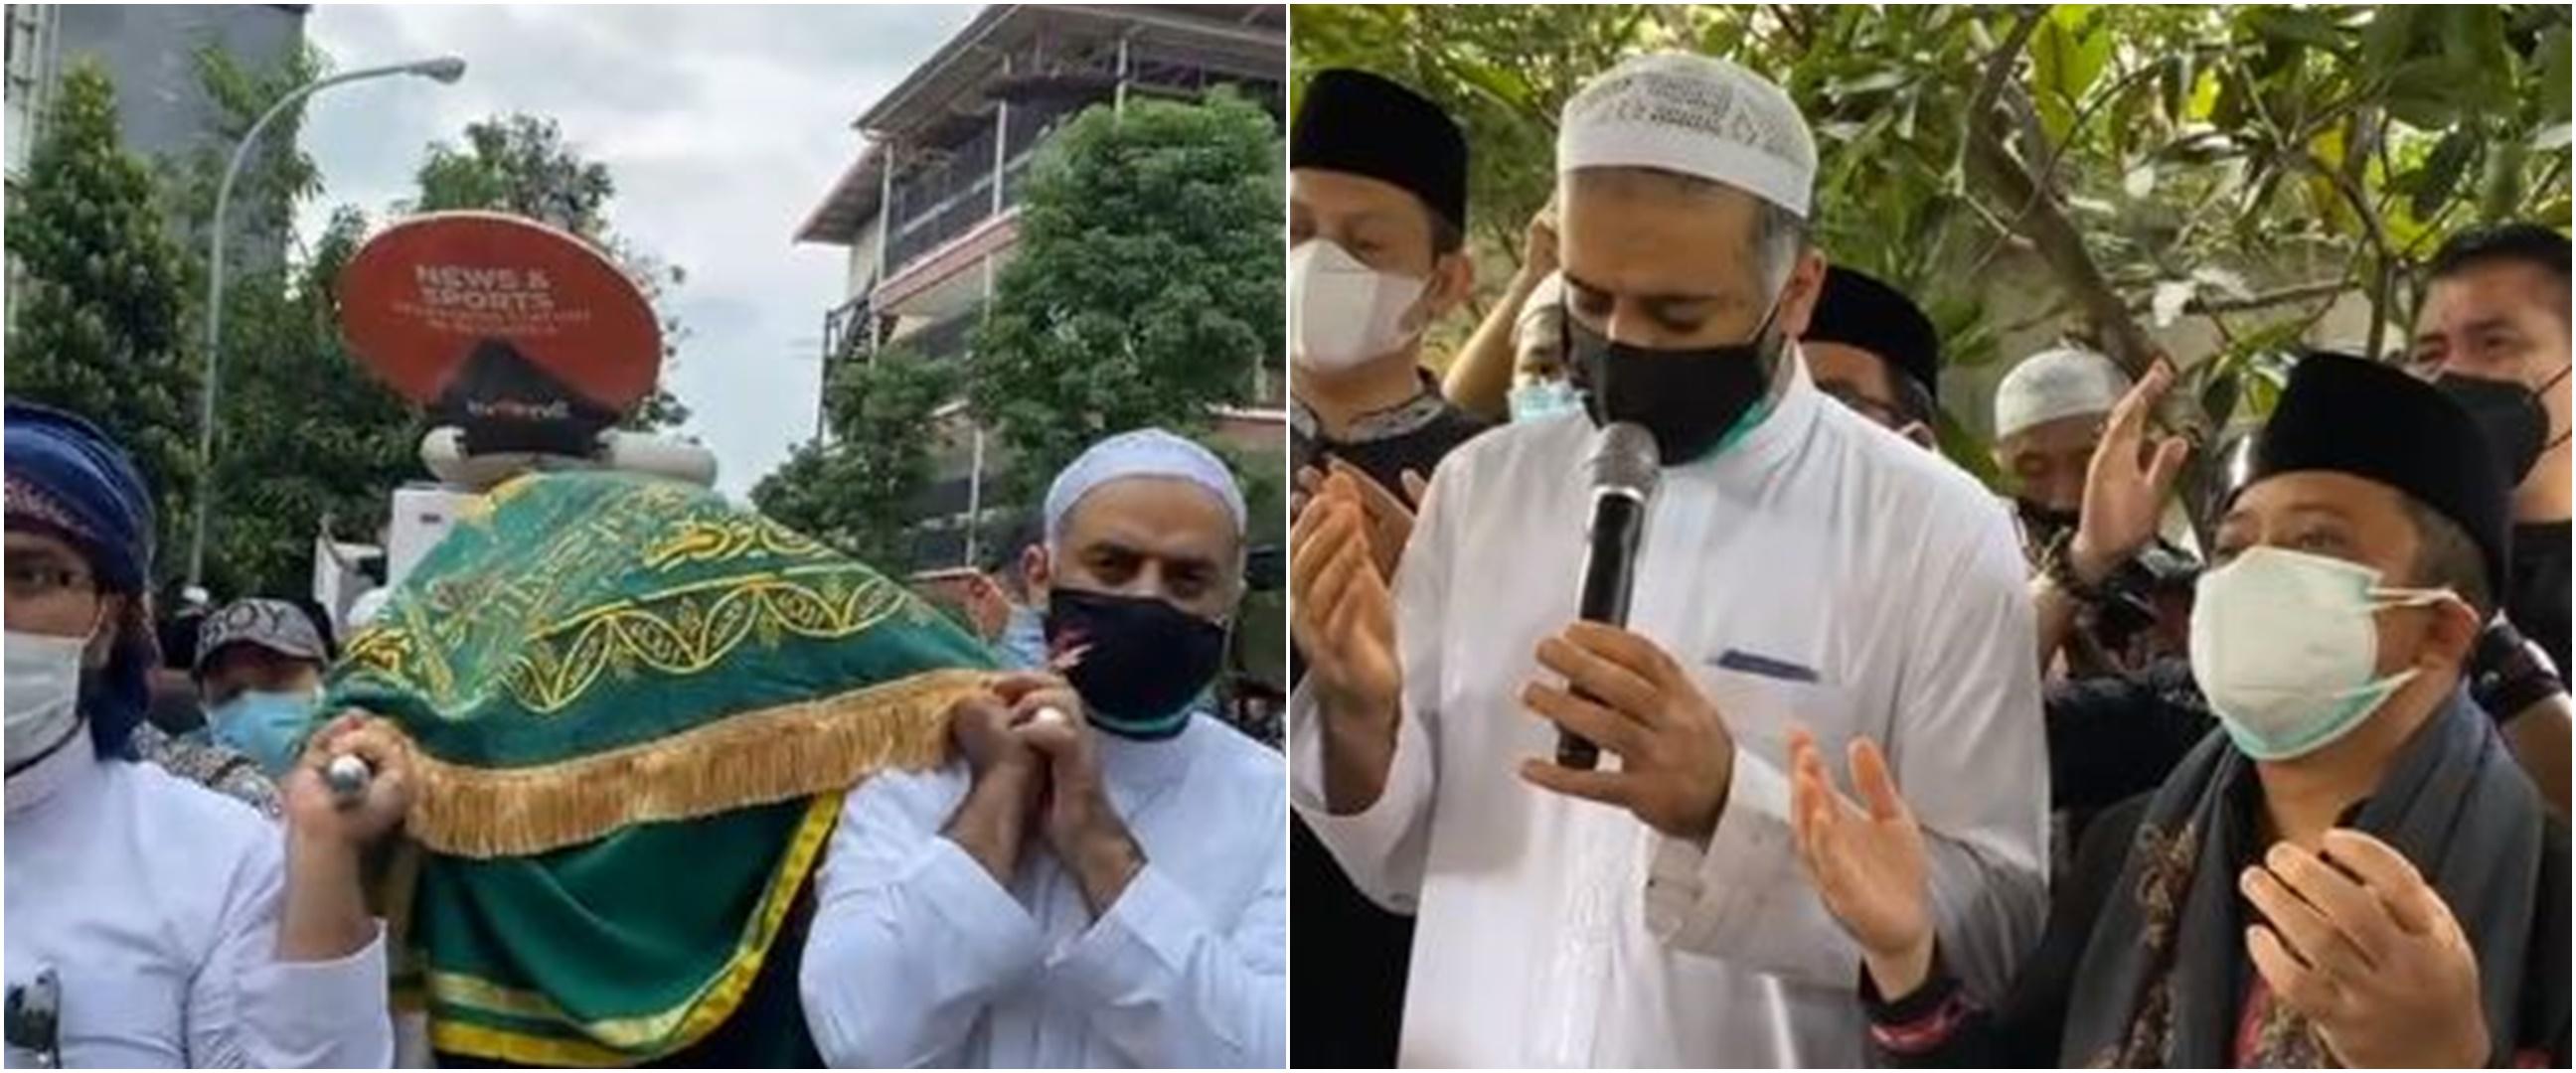 8 Momen pemakaman Syekh Ali Jaber di Pesantren milik Yusuf Mansur